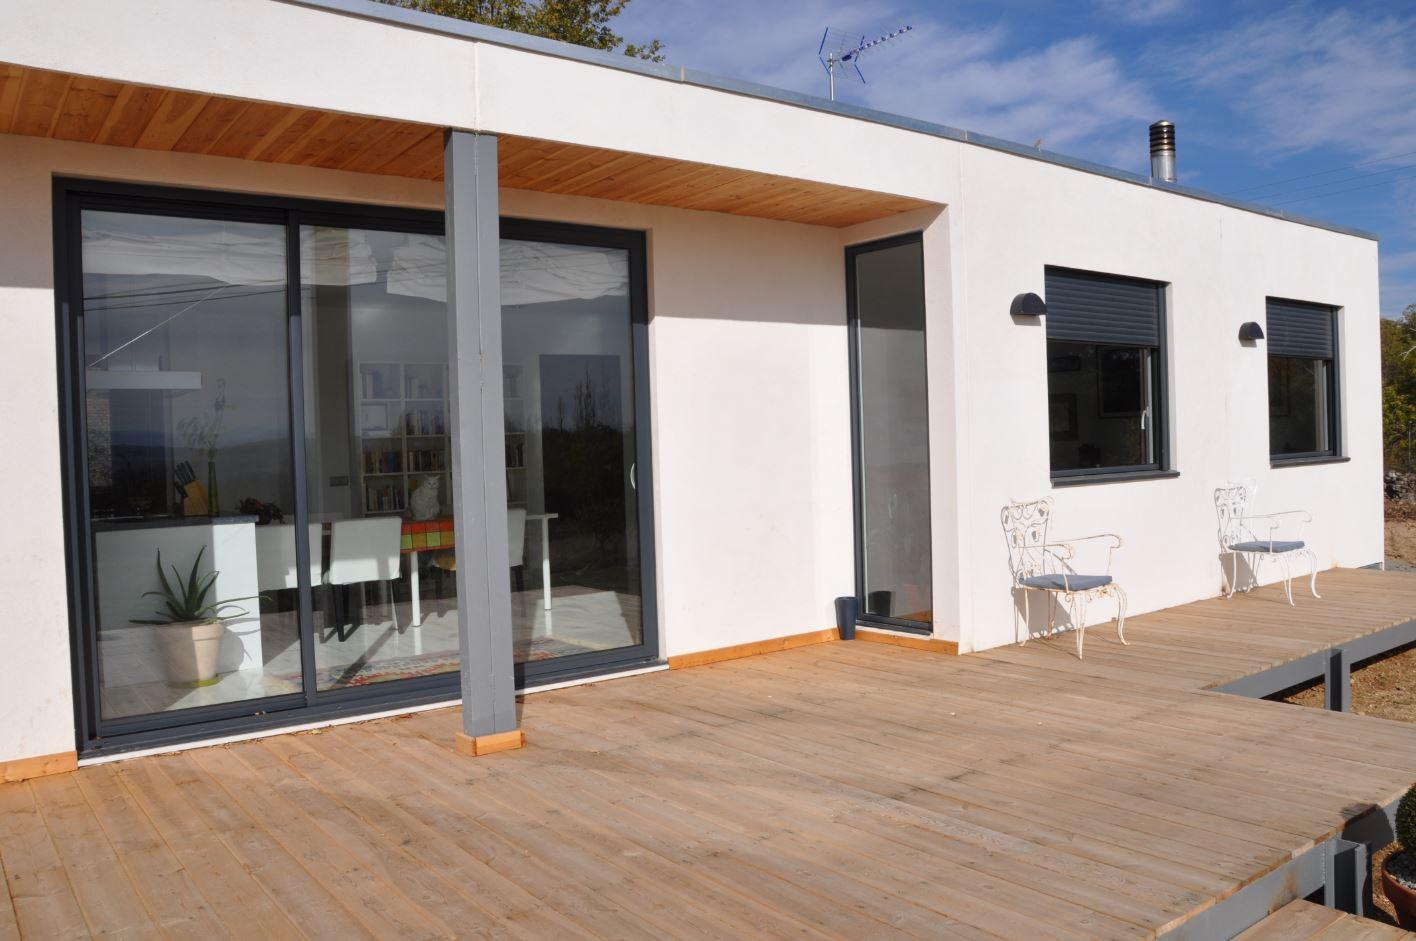 Fachadas de casas prefabricadas - Viviendas prefabricadas ...